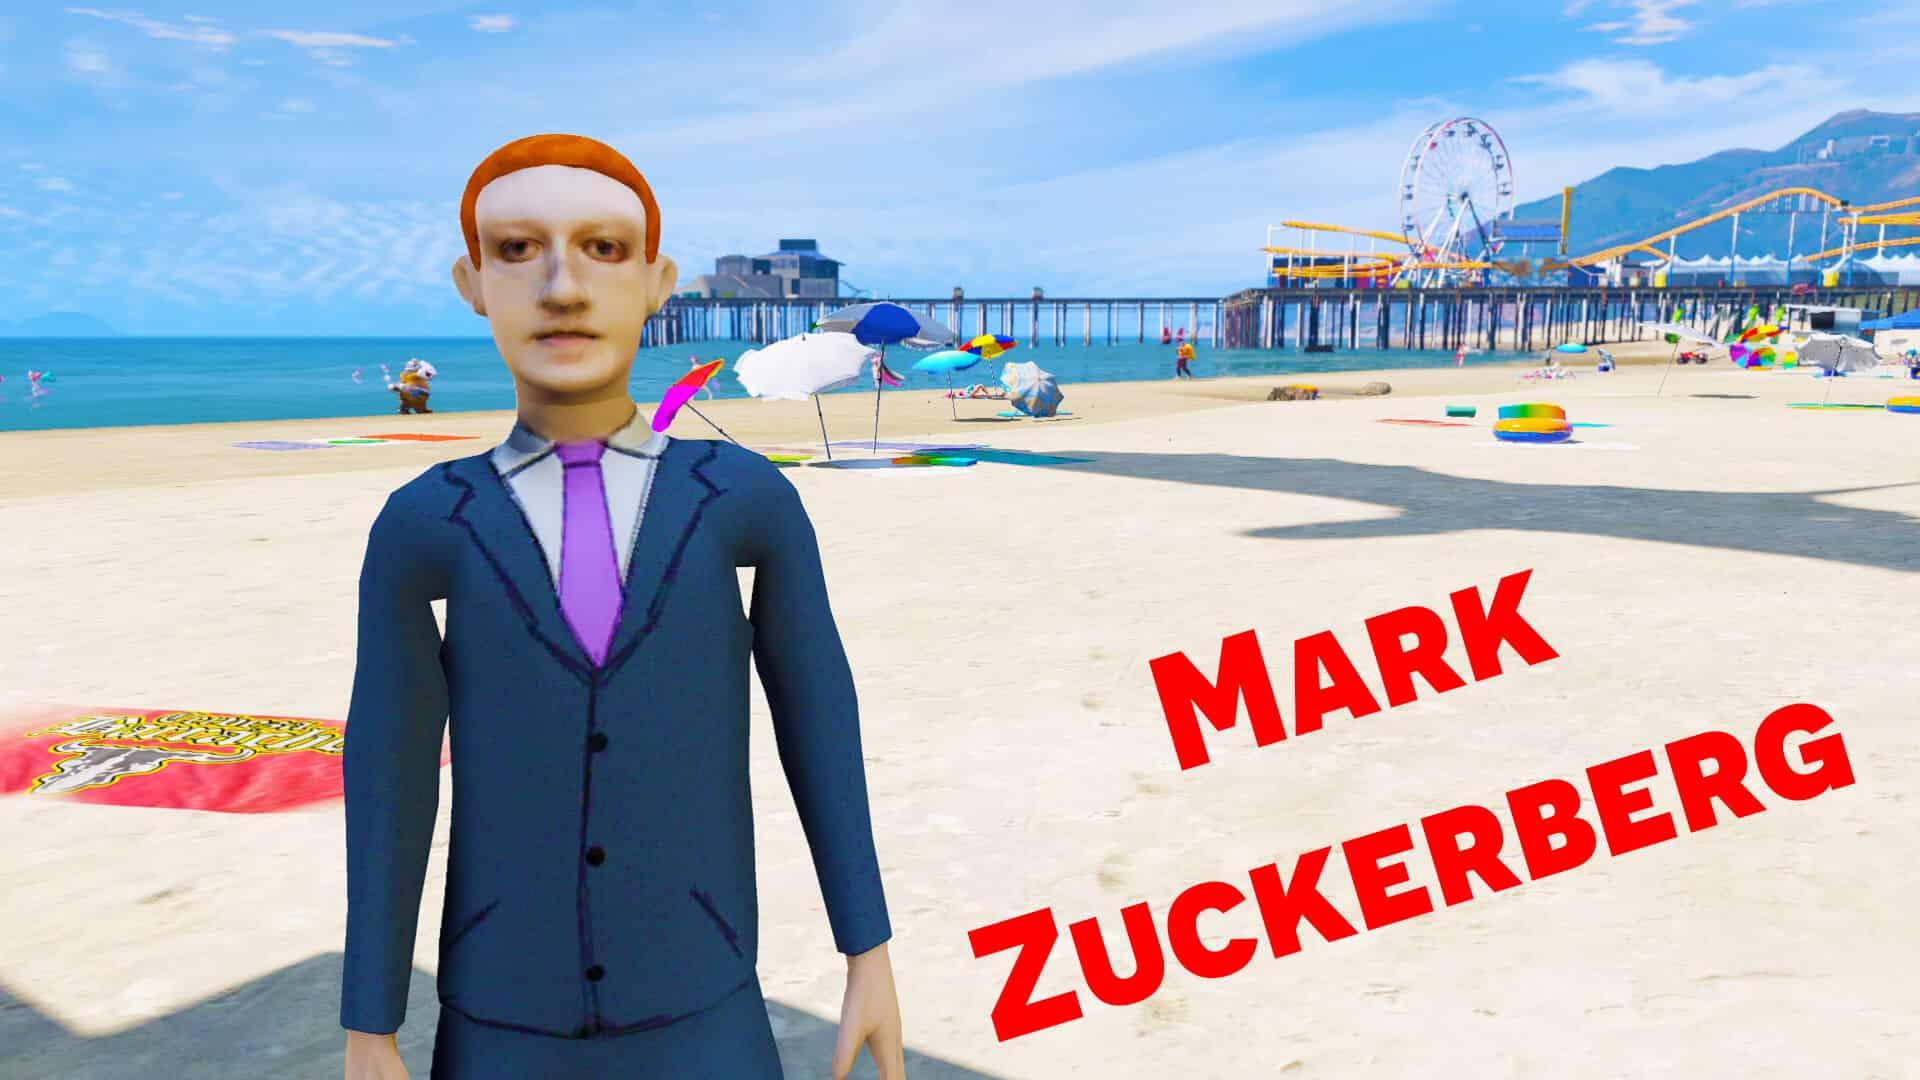 gta-5-mod-mark-zuckerberg